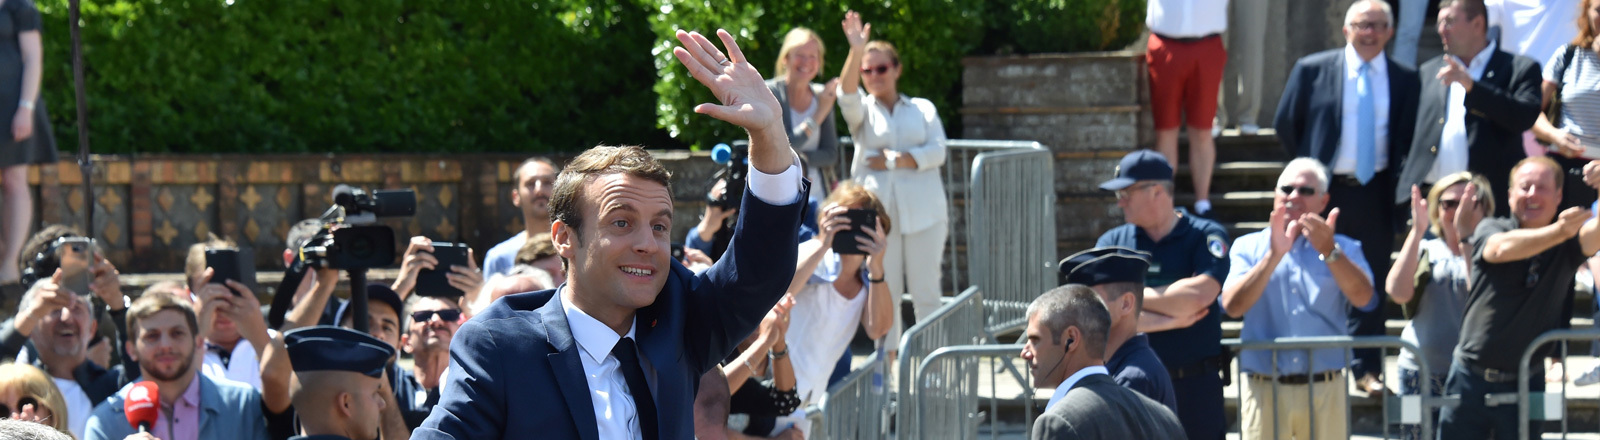 Emmanuel Macron winkt Menschen zu